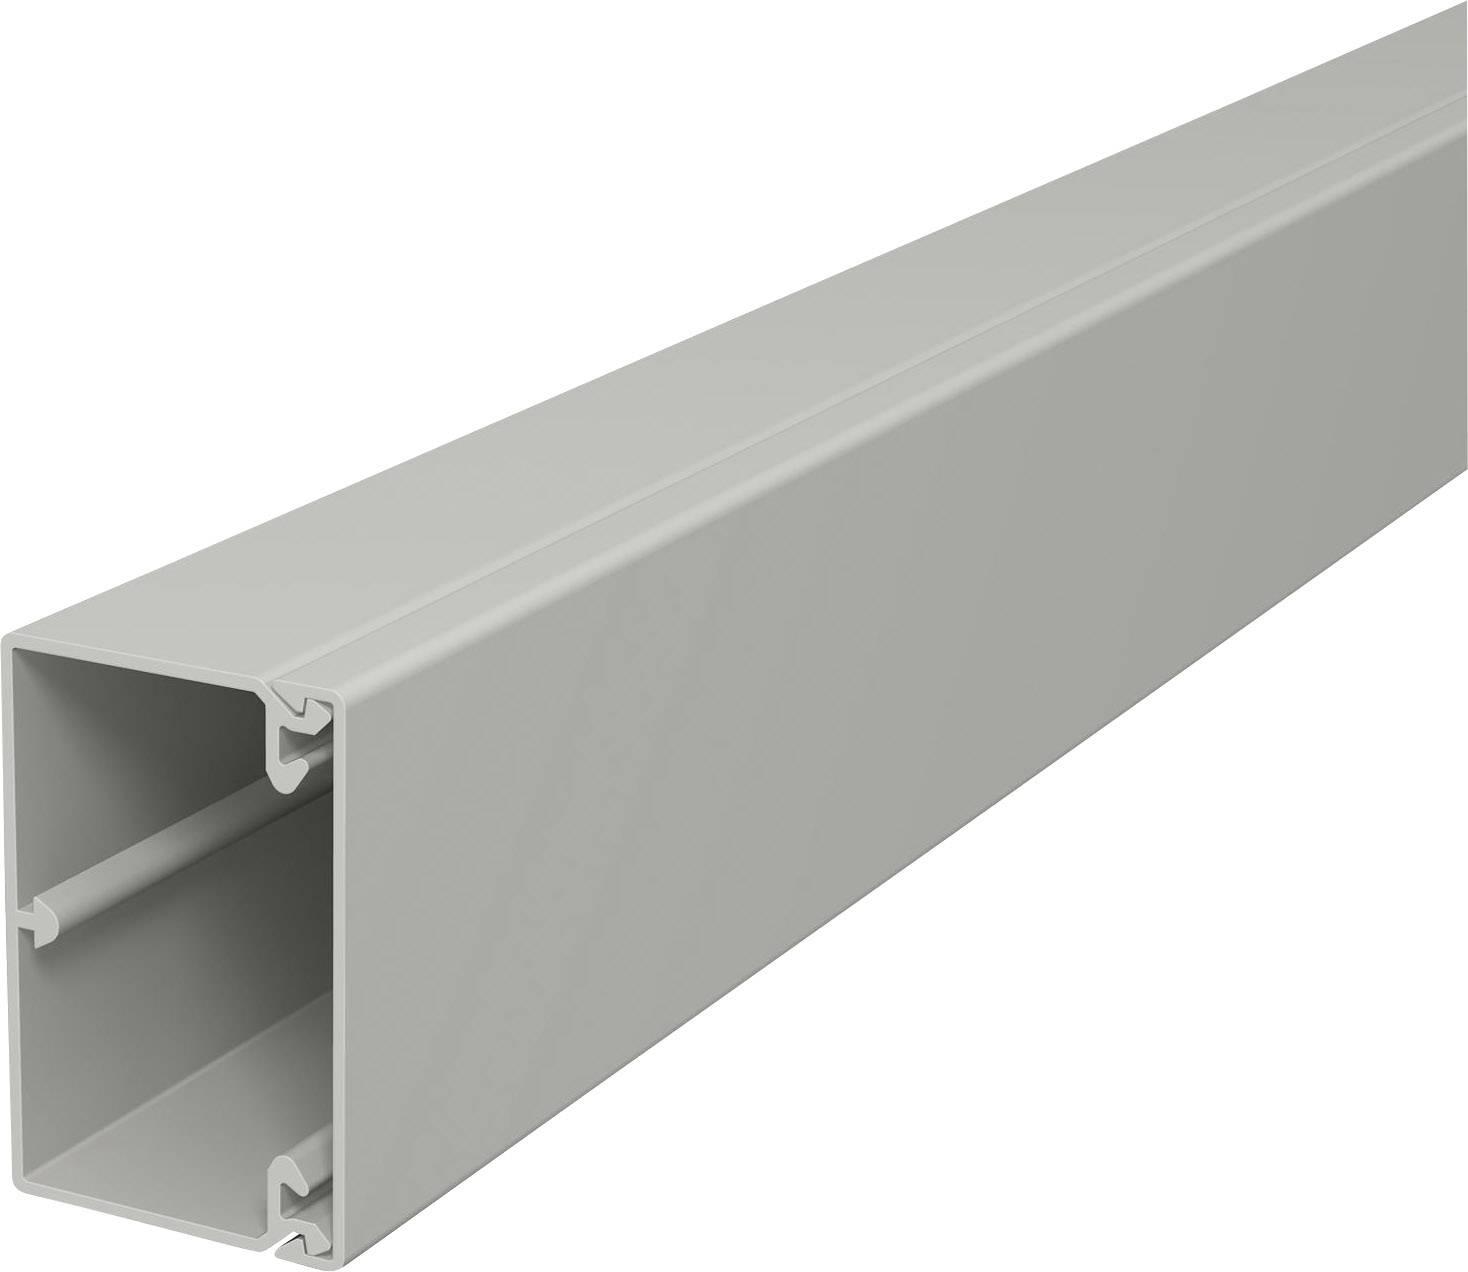 Elektroinstalační lišta s krytem OBO Bettermann, 6189571, 60 x 40 mm, 2 m, čistě bílá